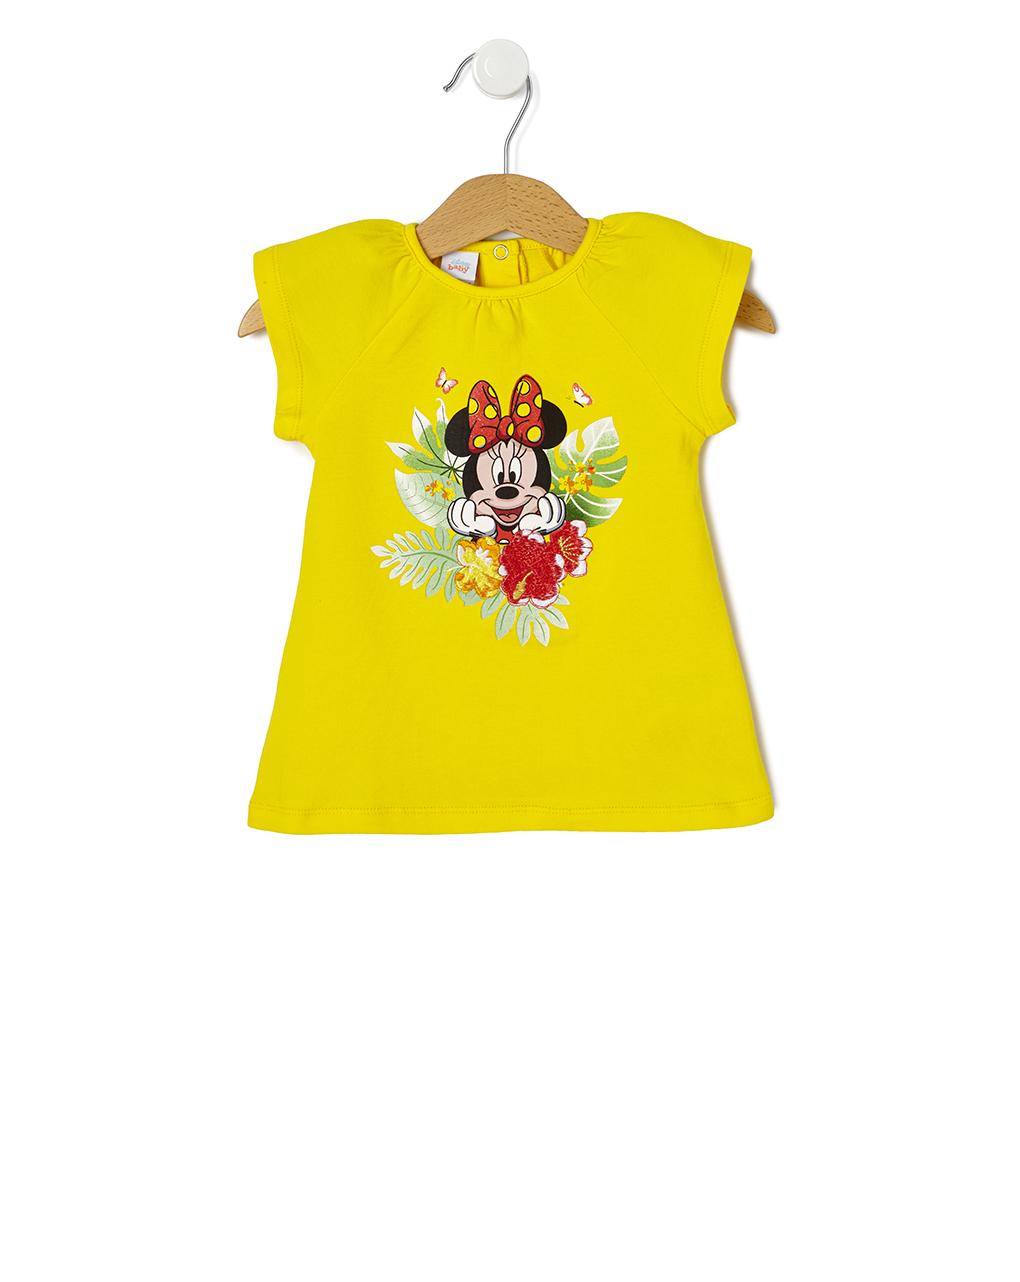 T-Shirt Jersey Κίτρινο με Στάμπα Minnie για Κορίτσι